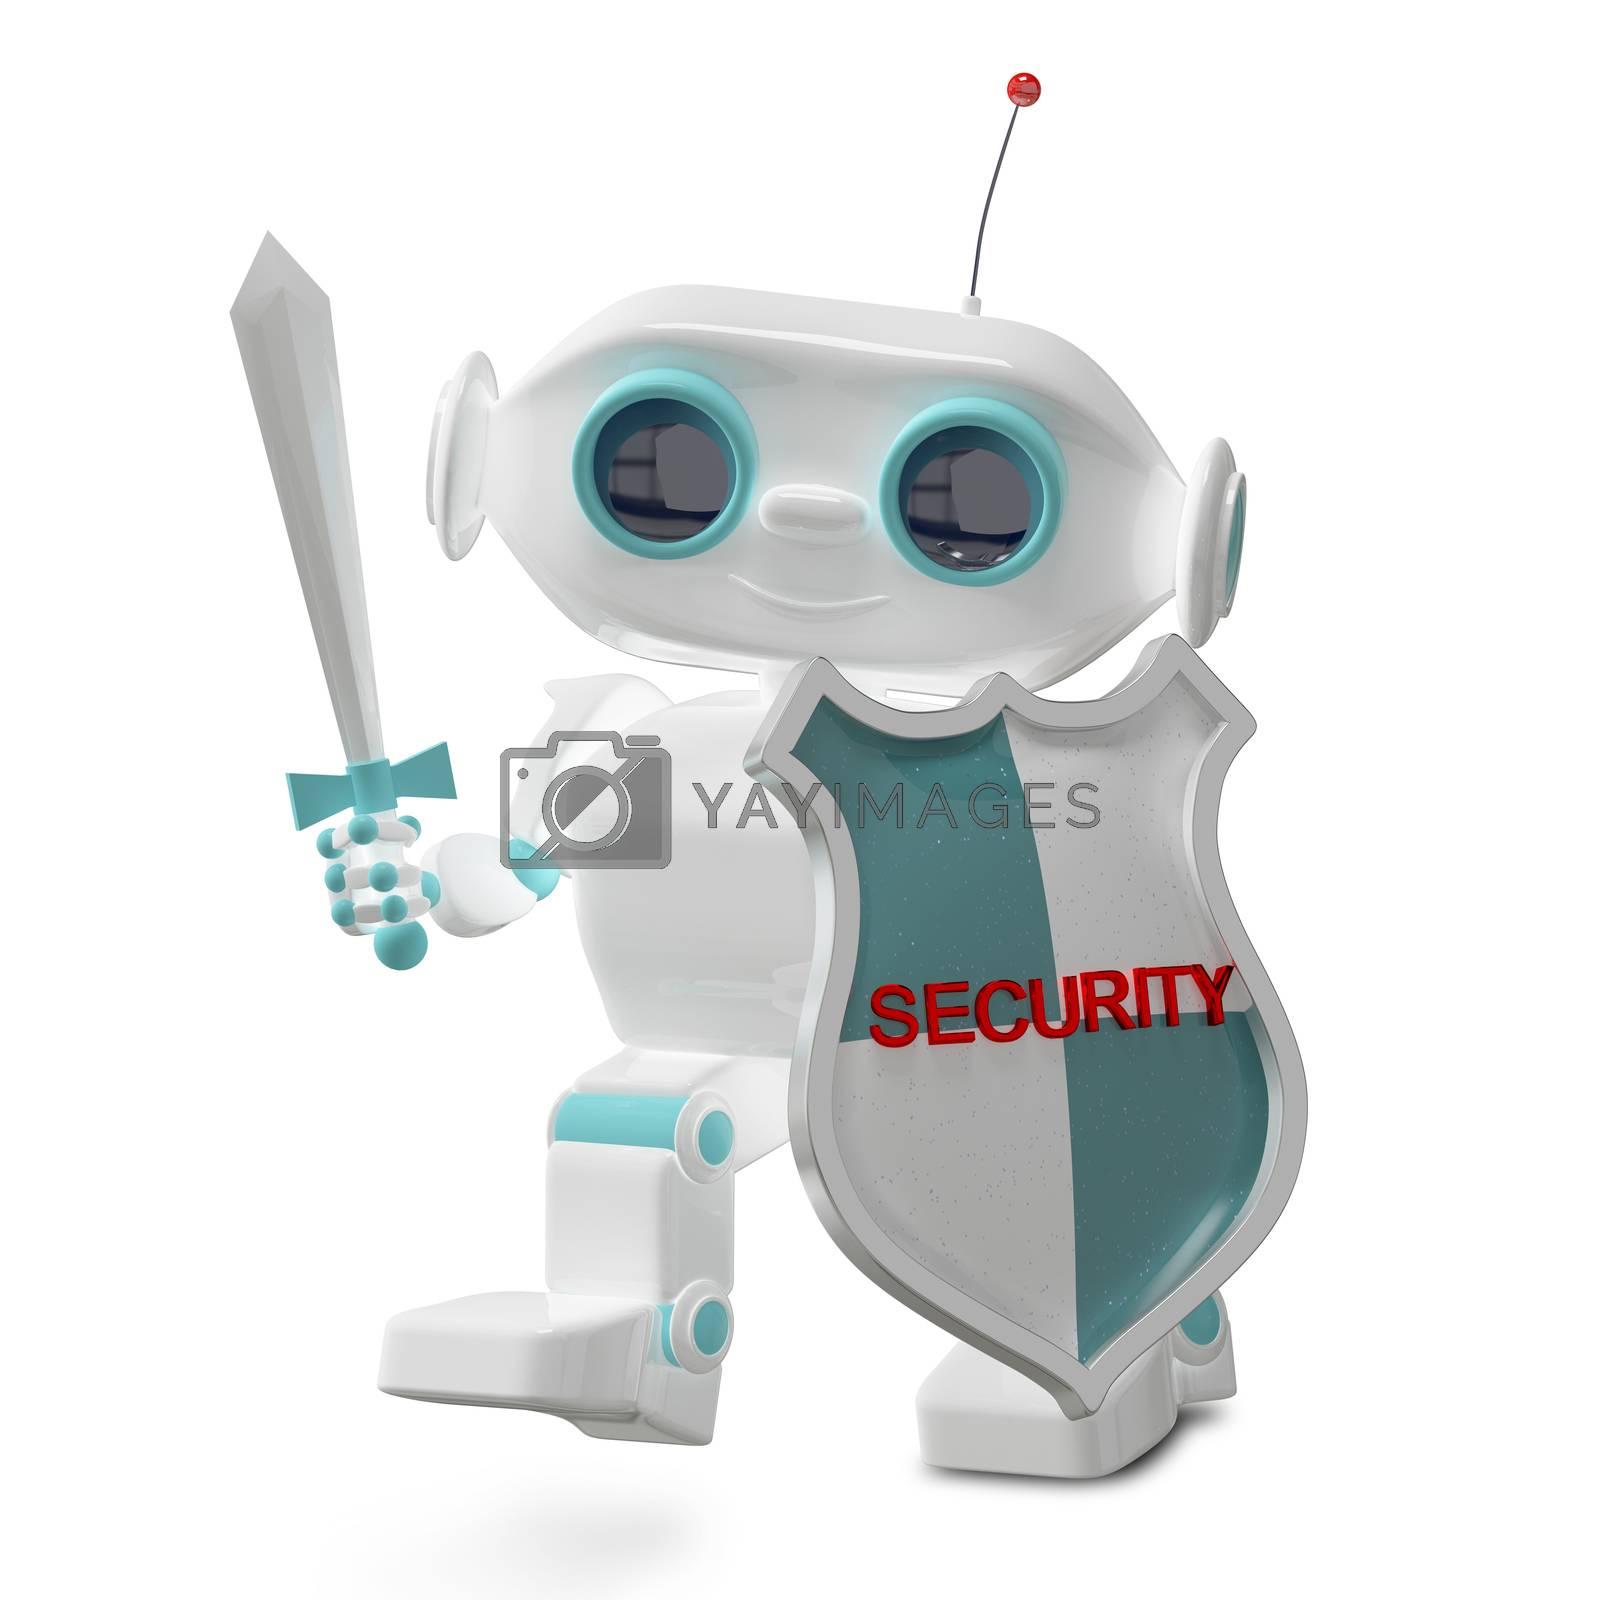 3D Illustration Security Little Robot on White Background